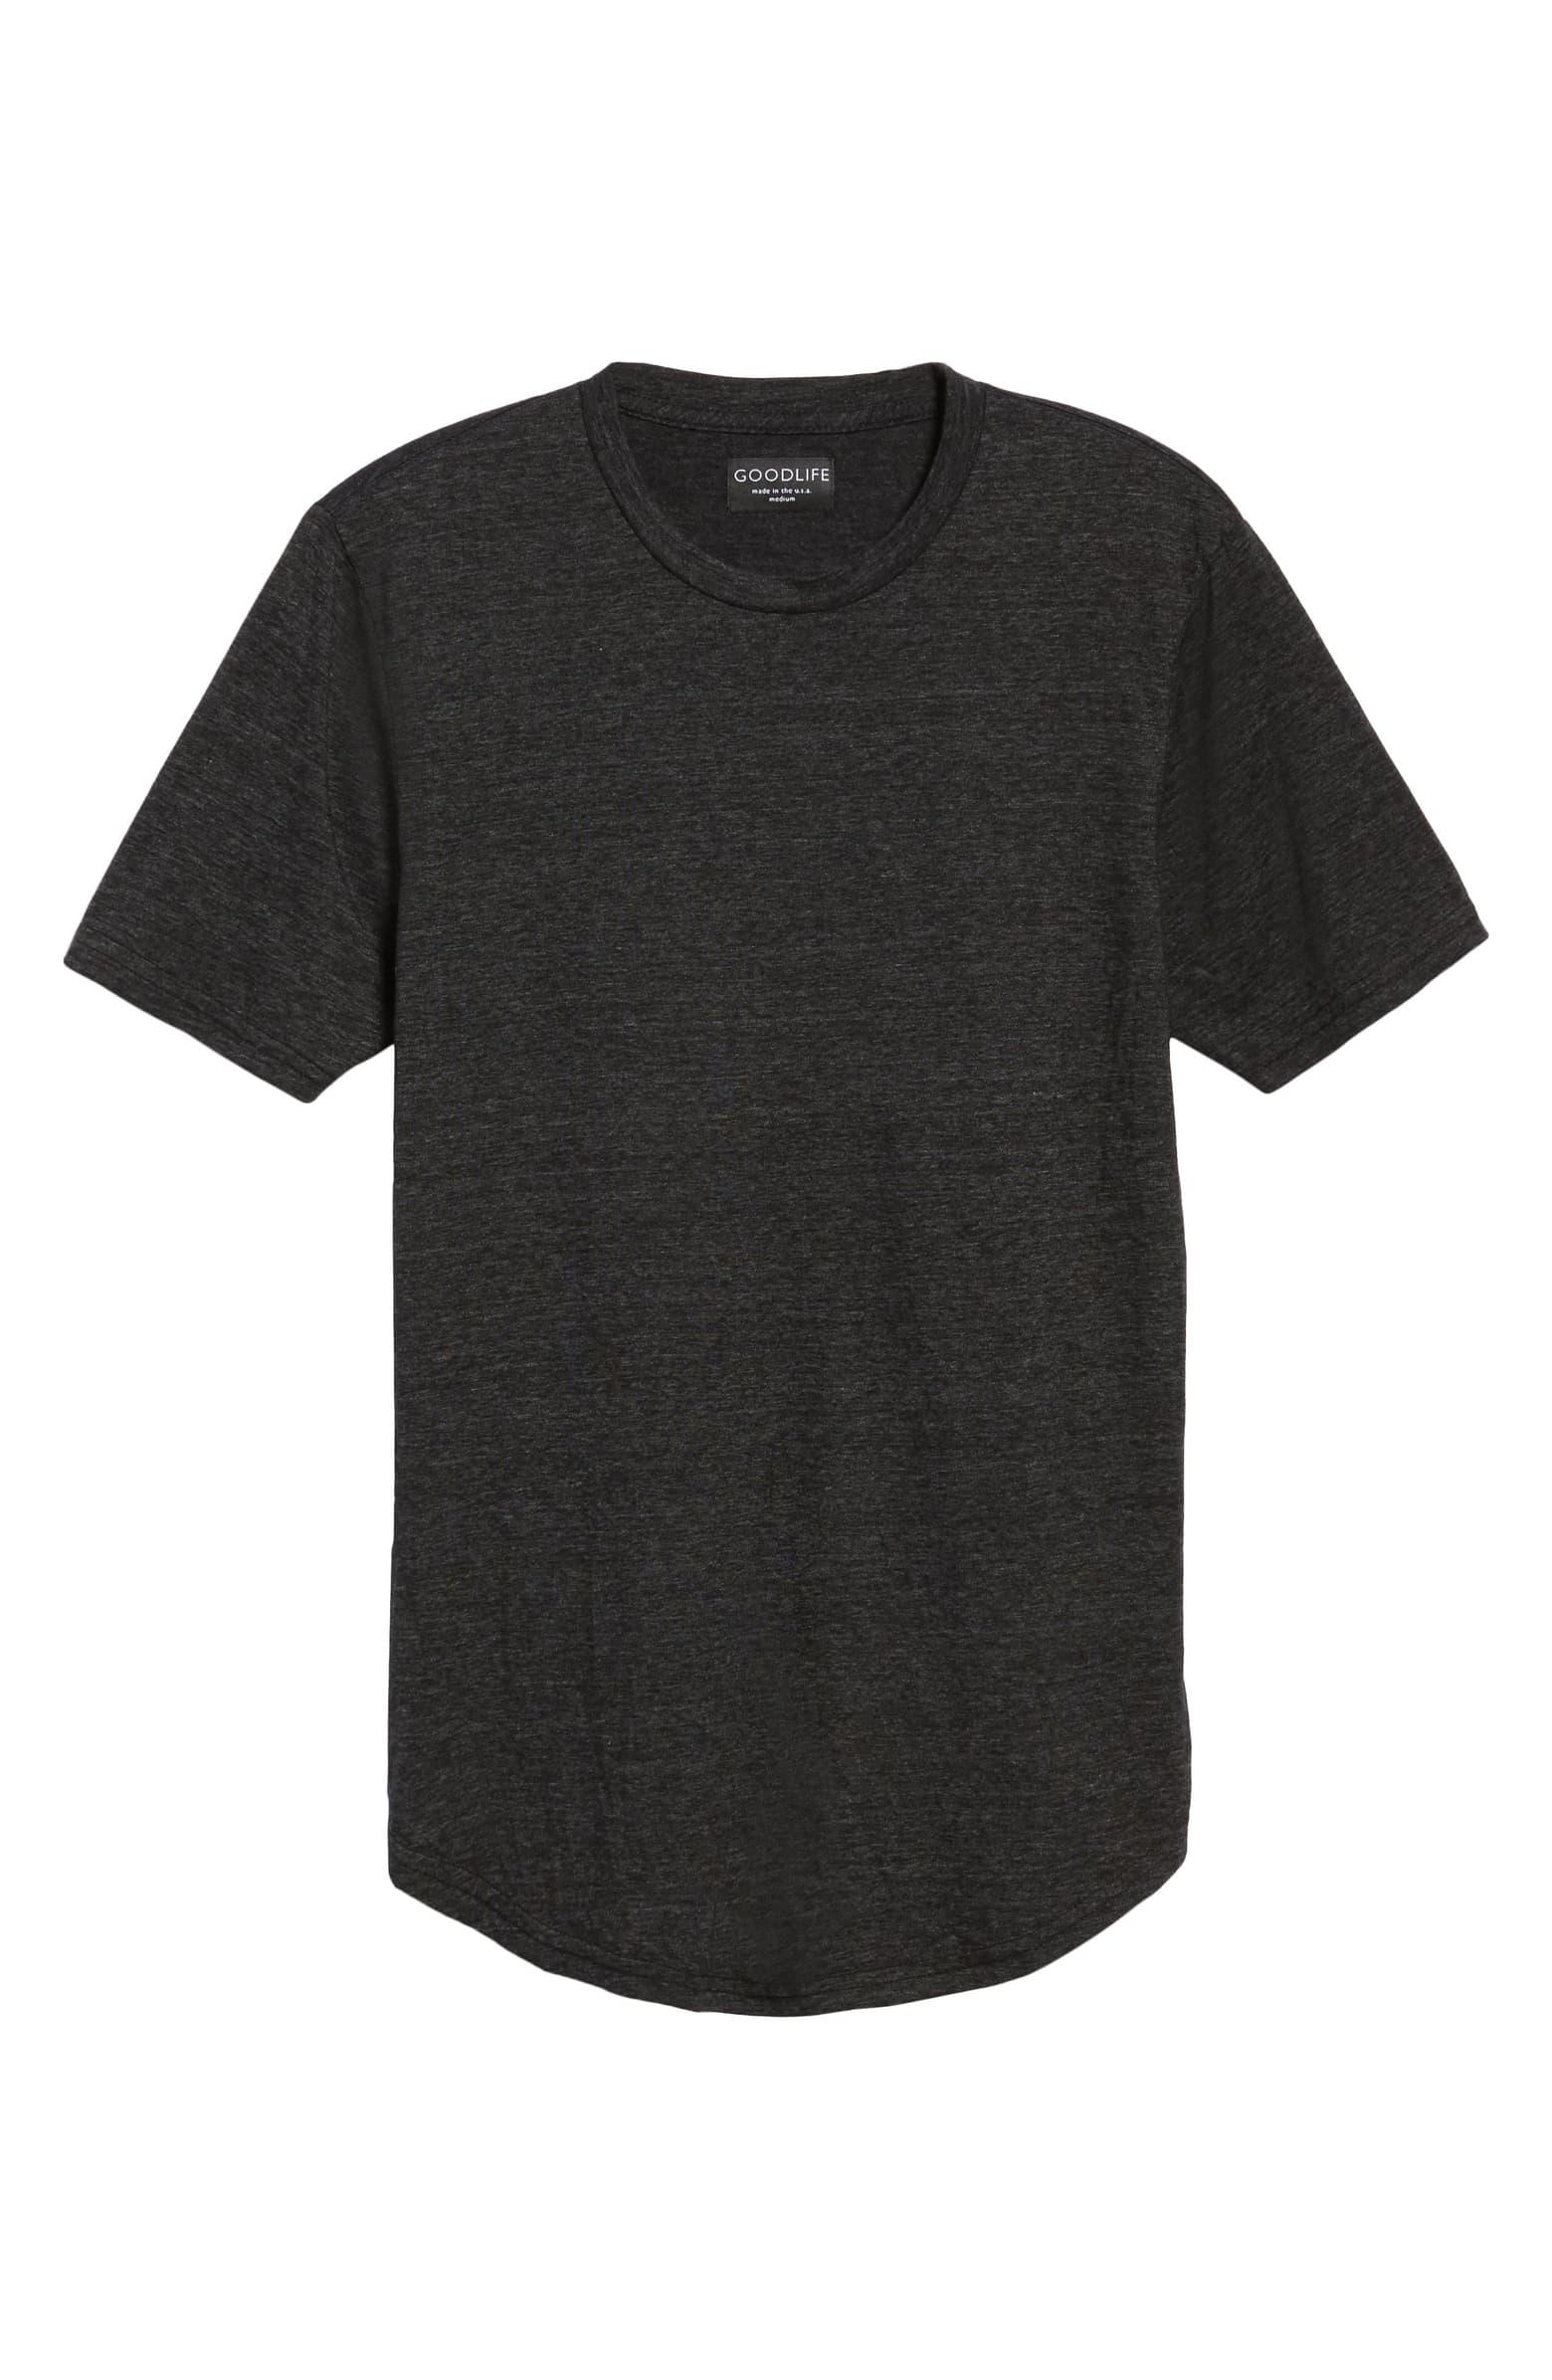 Scalloped Triblend Crewneck T-shirt